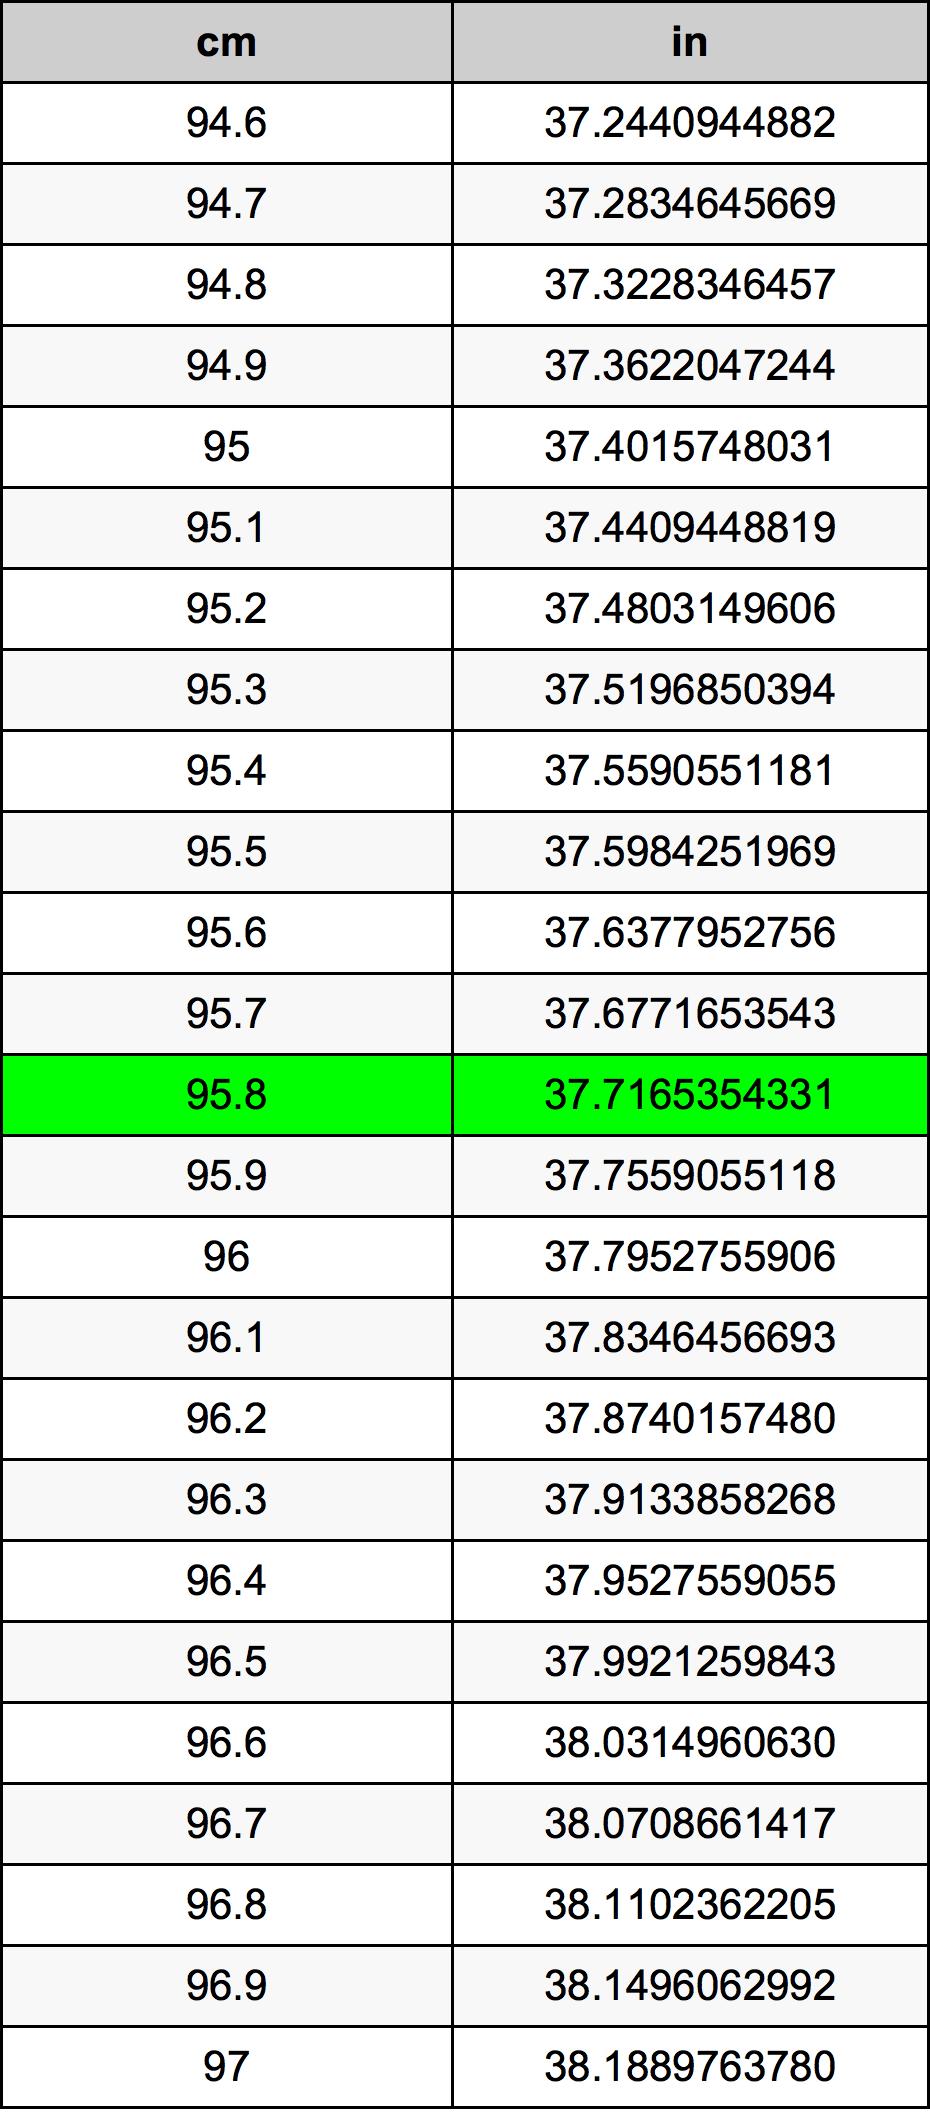 95.8 Centimeter konverteringstabellen